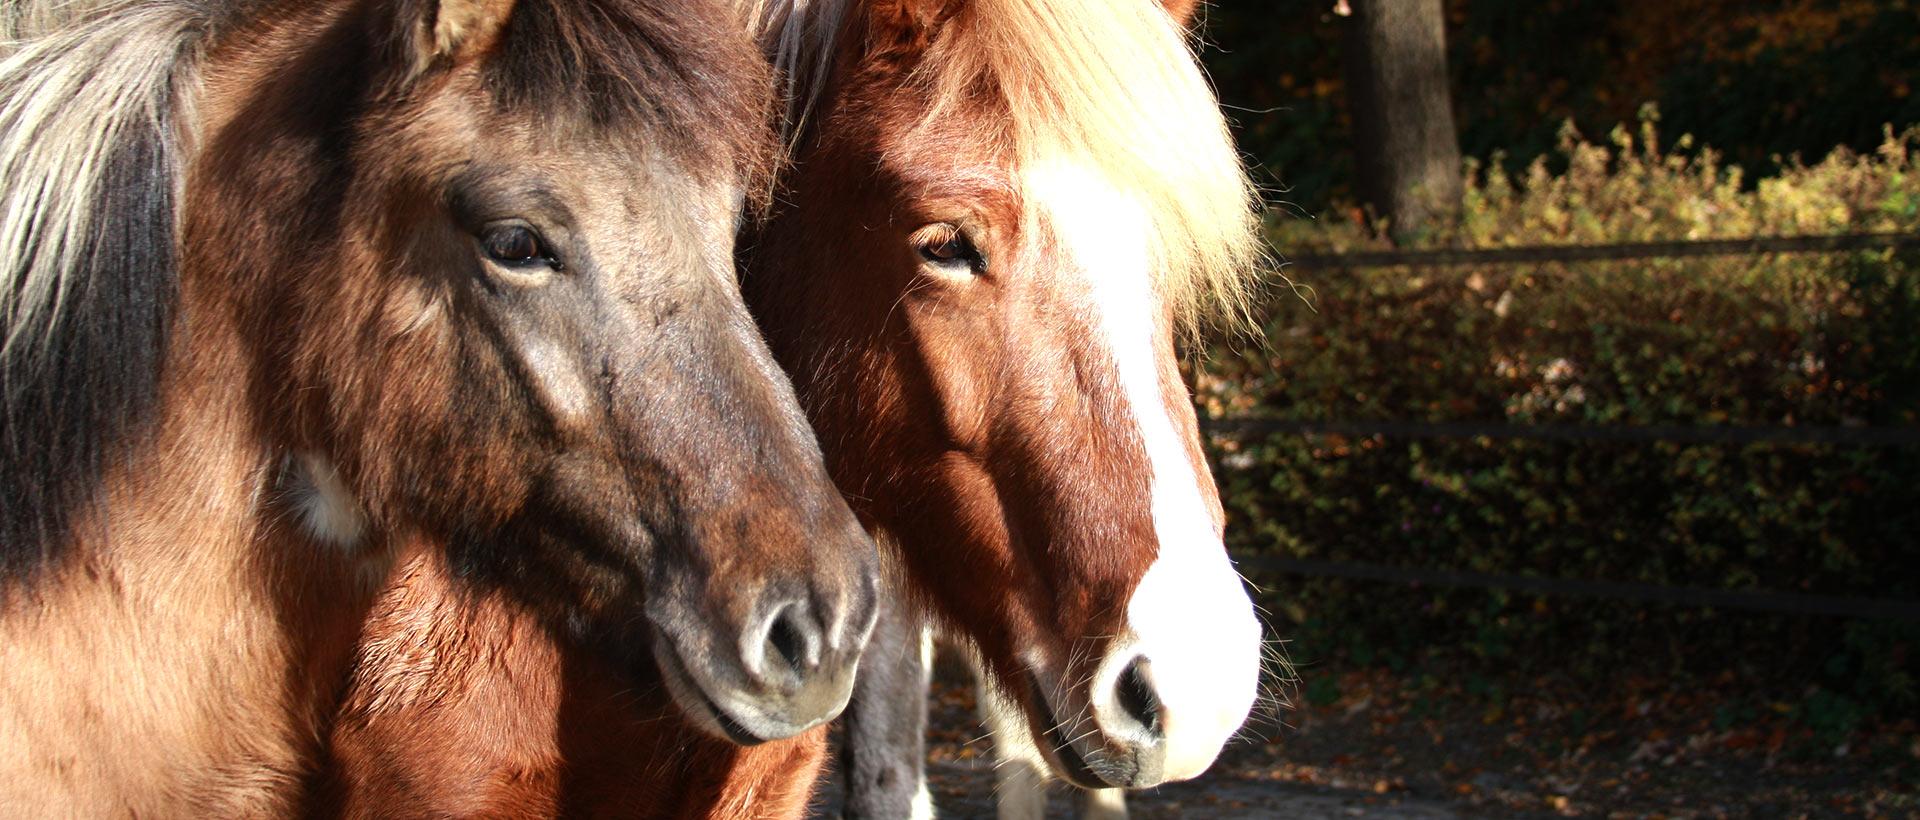 reitschule_berger_zwei_pferde_blicken